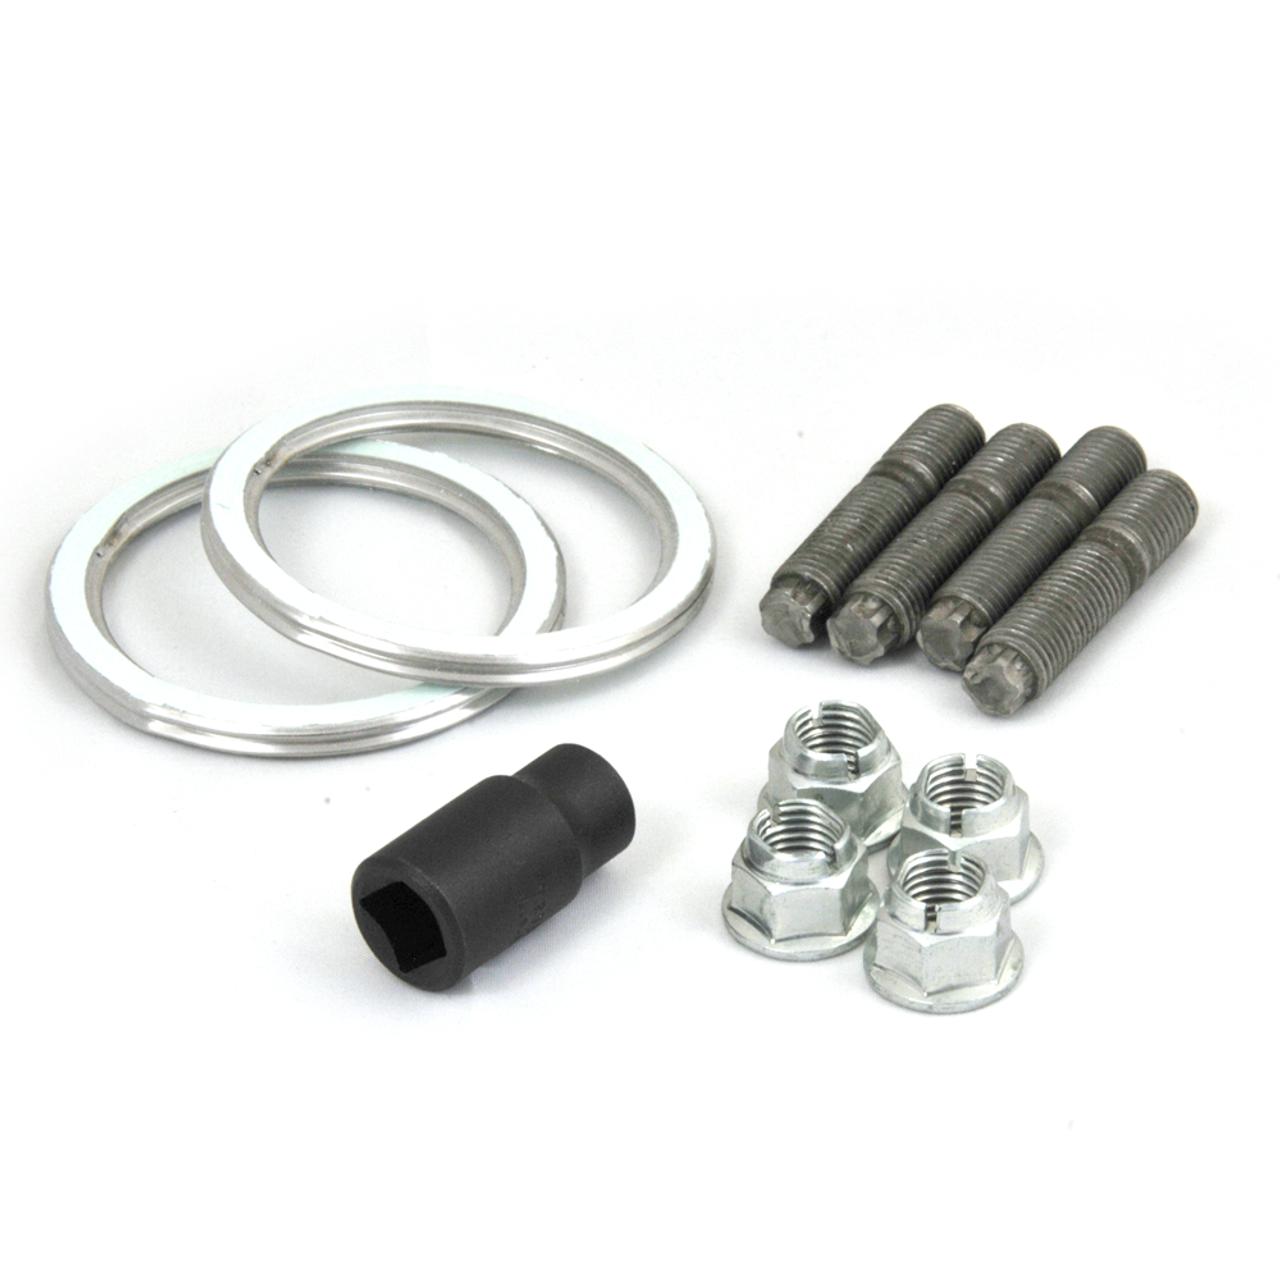 Exhaust Manifold Downpipe Kit (EMK-1)